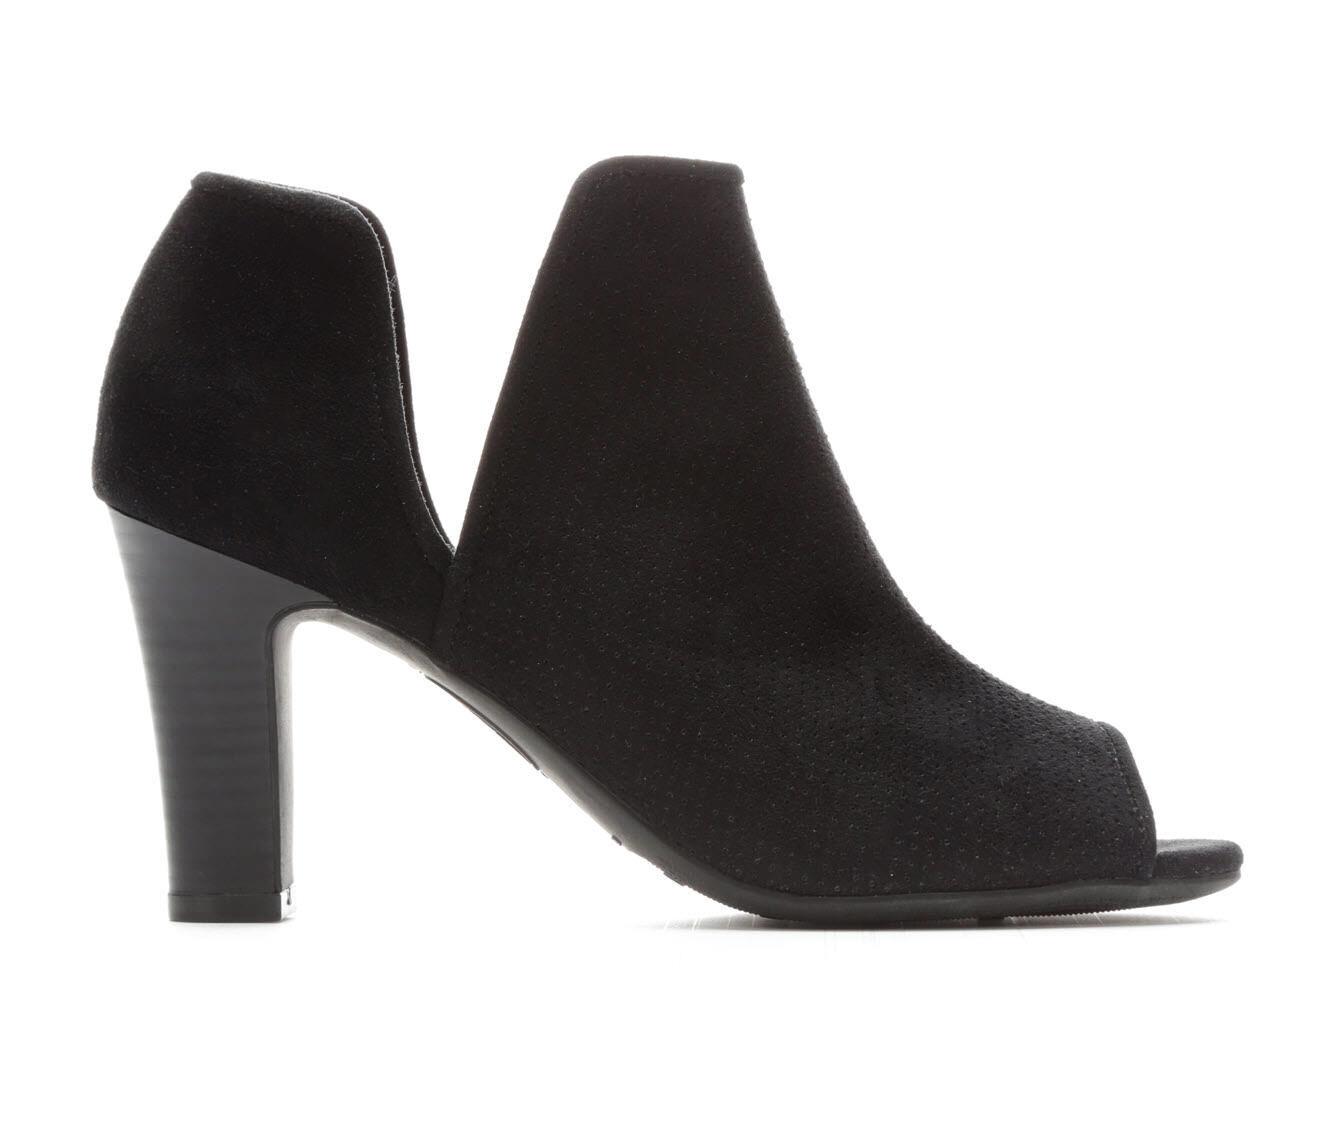 LifeStride Coana Women's High ... Heels buy cheap 2014 buy cheap for nice ef4GNCJZO